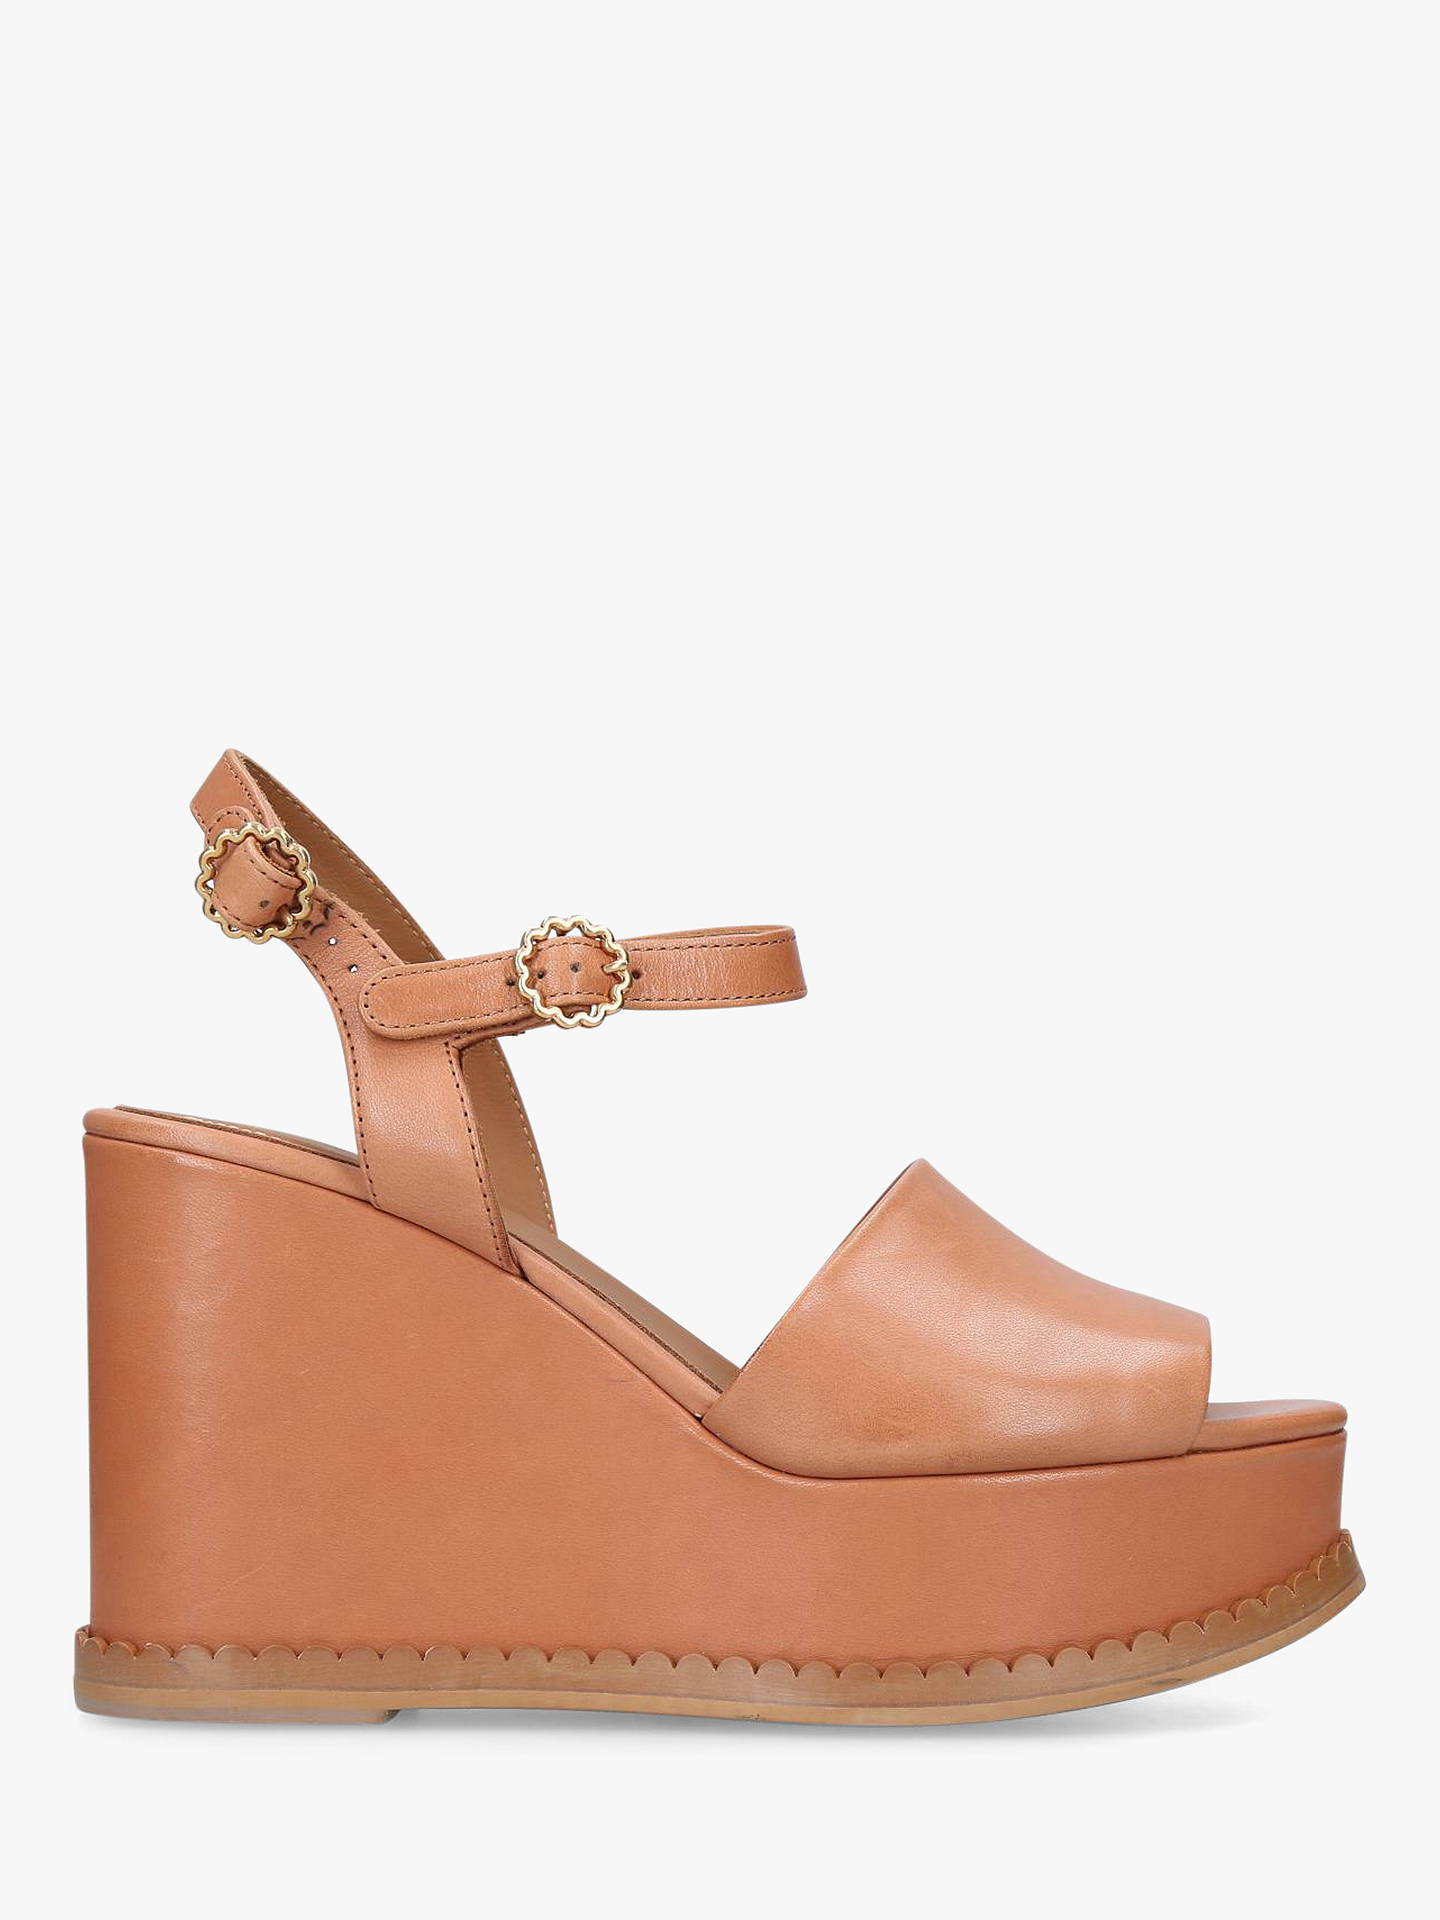 d8319e20084f43 Buy See By Chloé Texture Platform Sandals